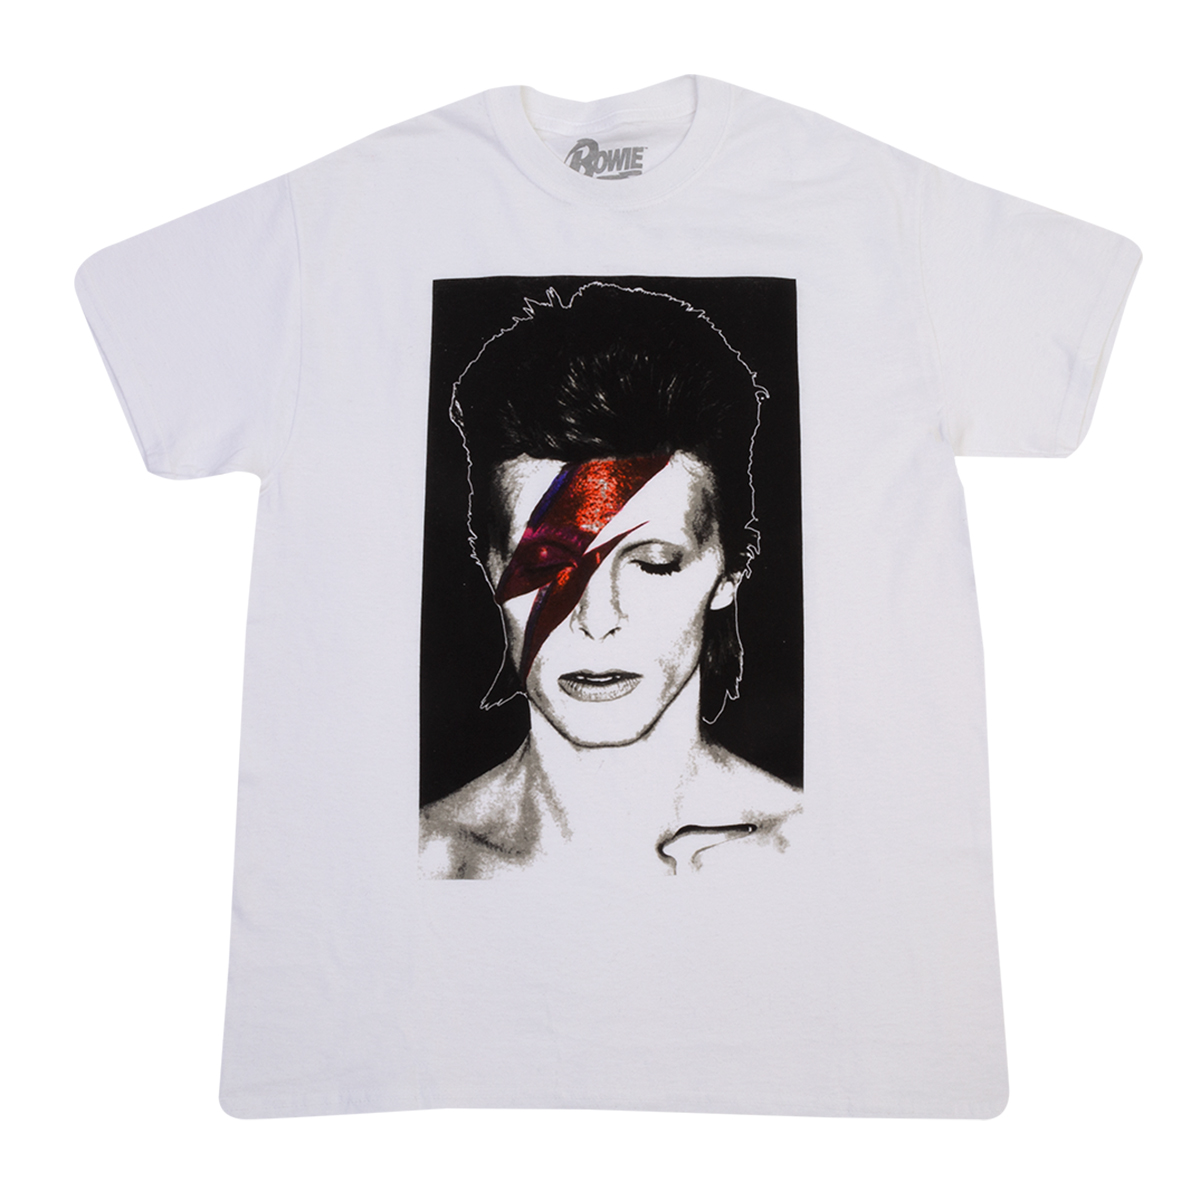 David Bowie Aladdin Sane Tee